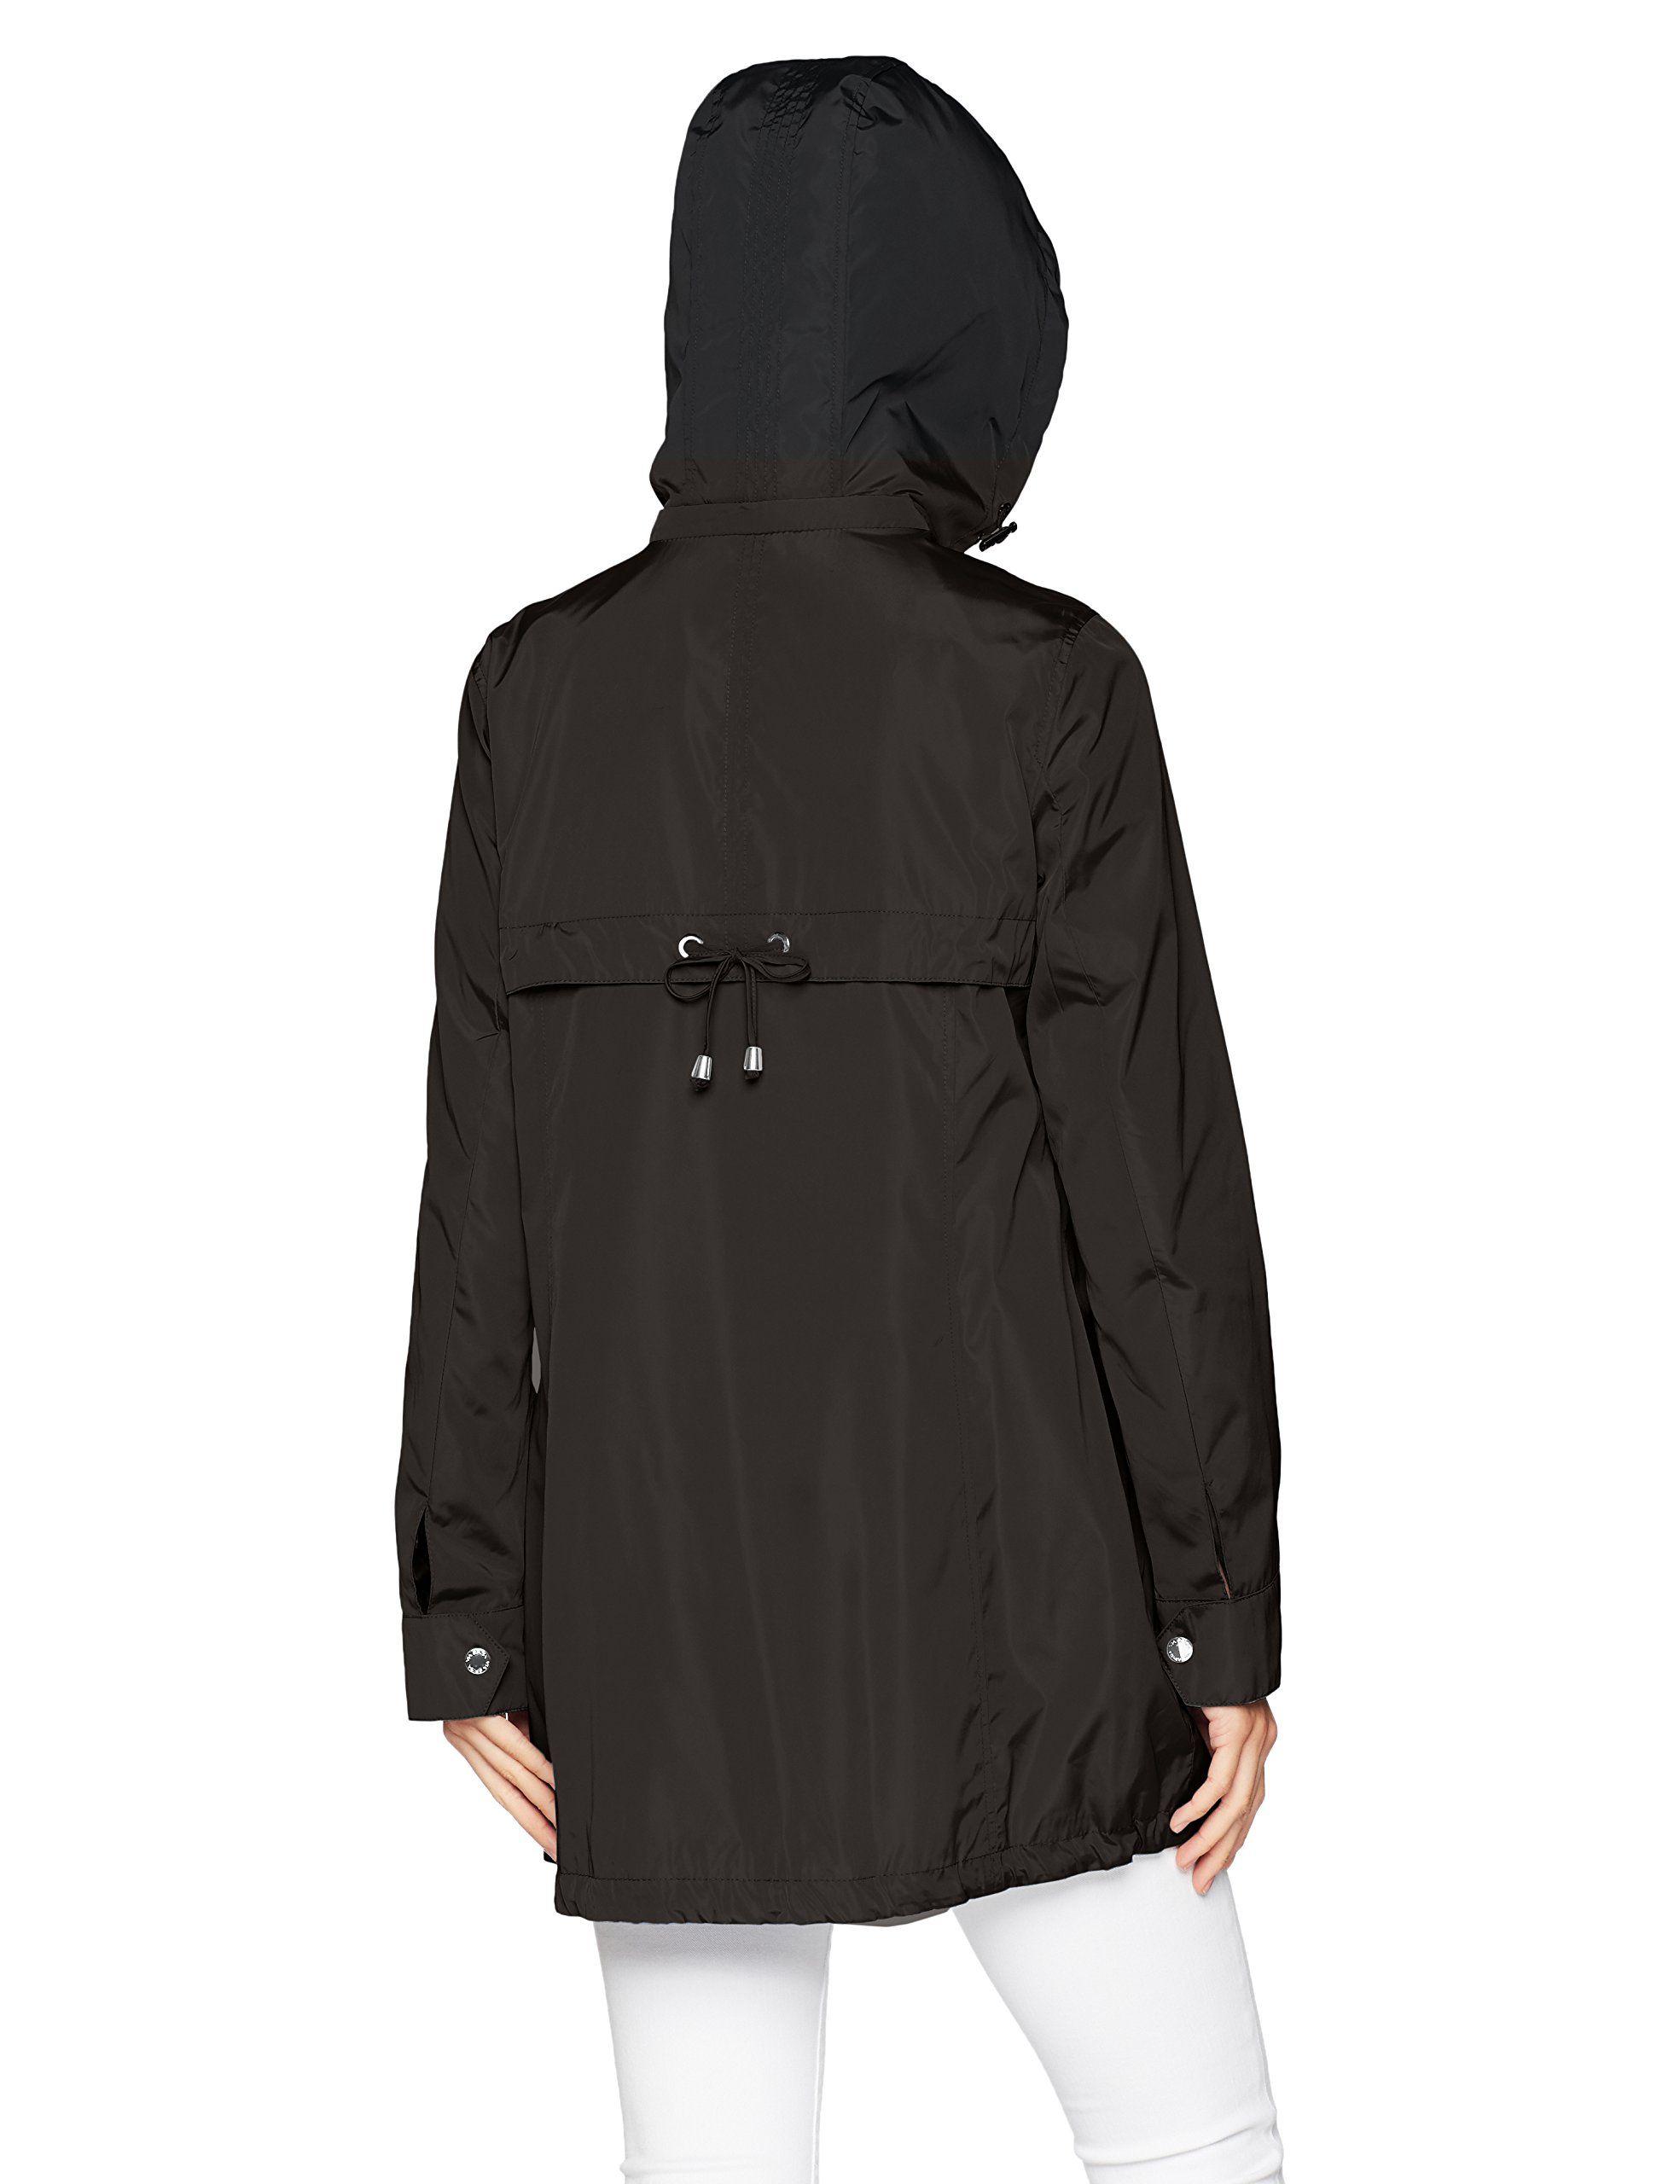 bac065684 Via Spiga Womens Aline Lightweight Packable Rain Jacket Black XS ...